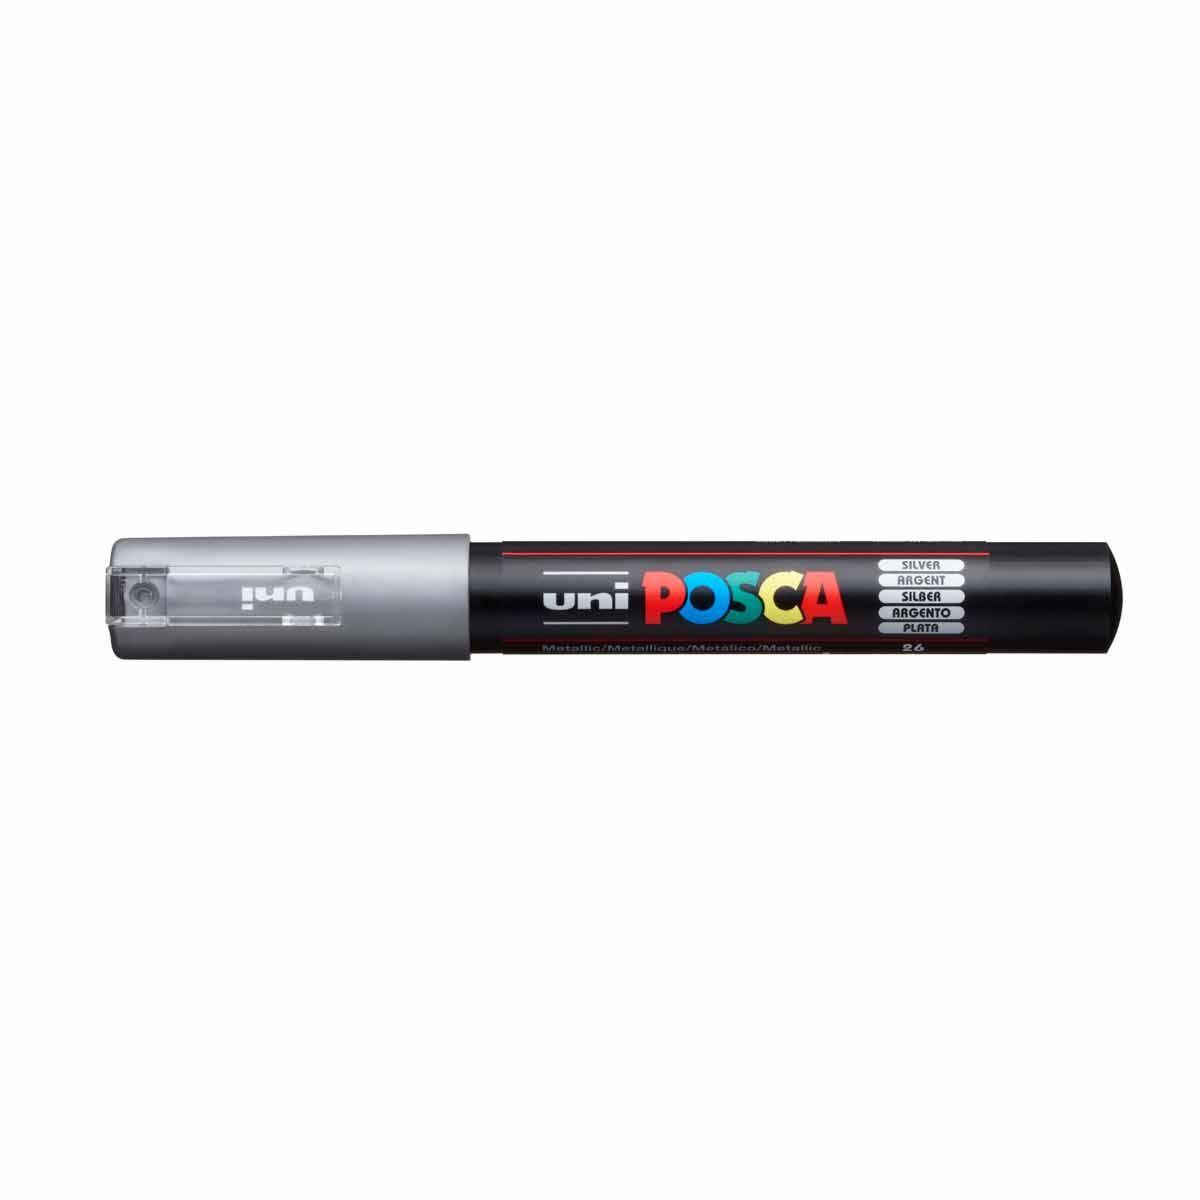 Uni Posca Marker Pen Fine PC-1M 0.7mm Metallic